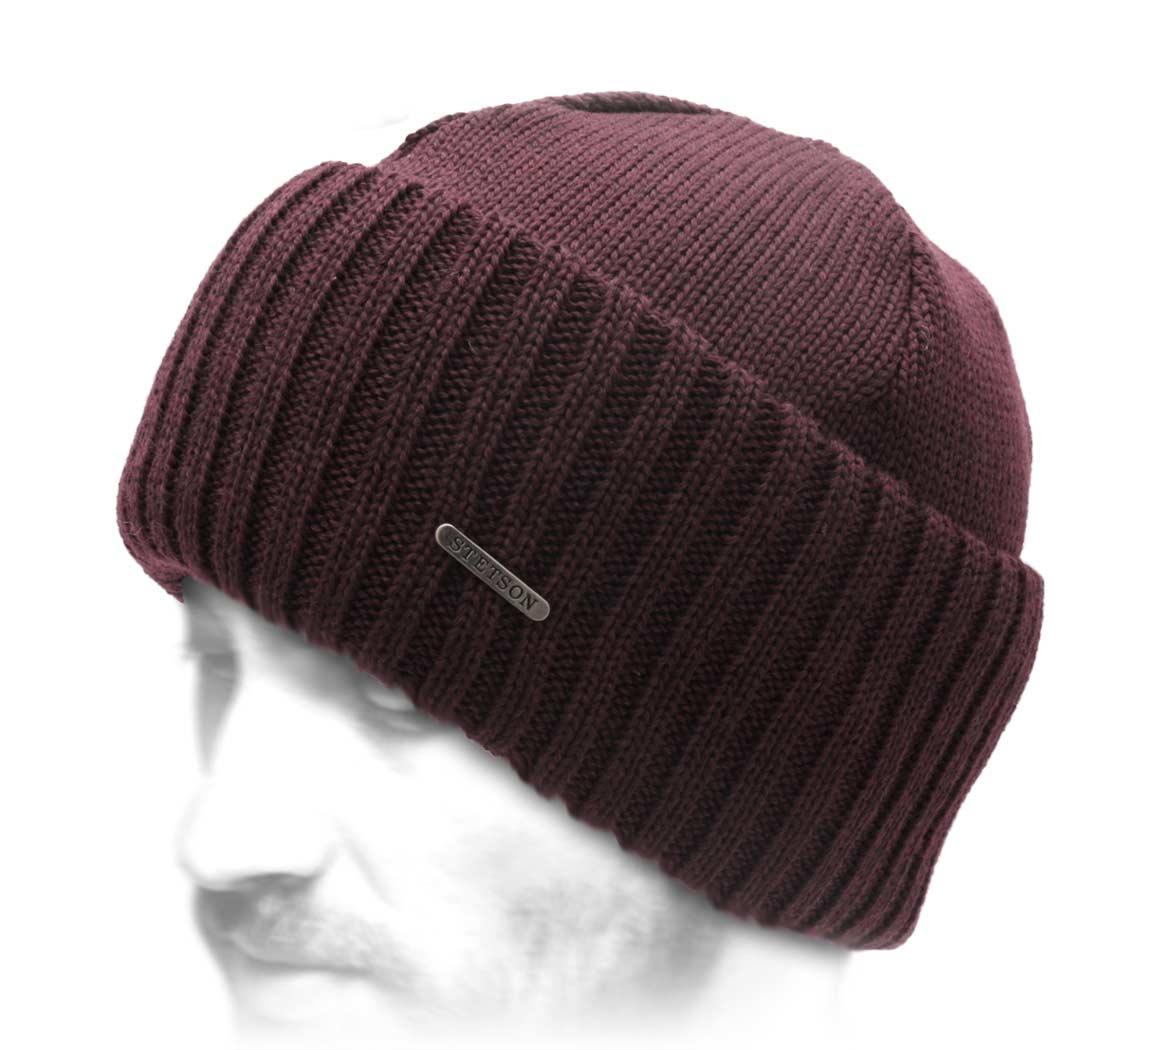 Northport Merino Wool - Beanies Stetson f9ce741c92d0